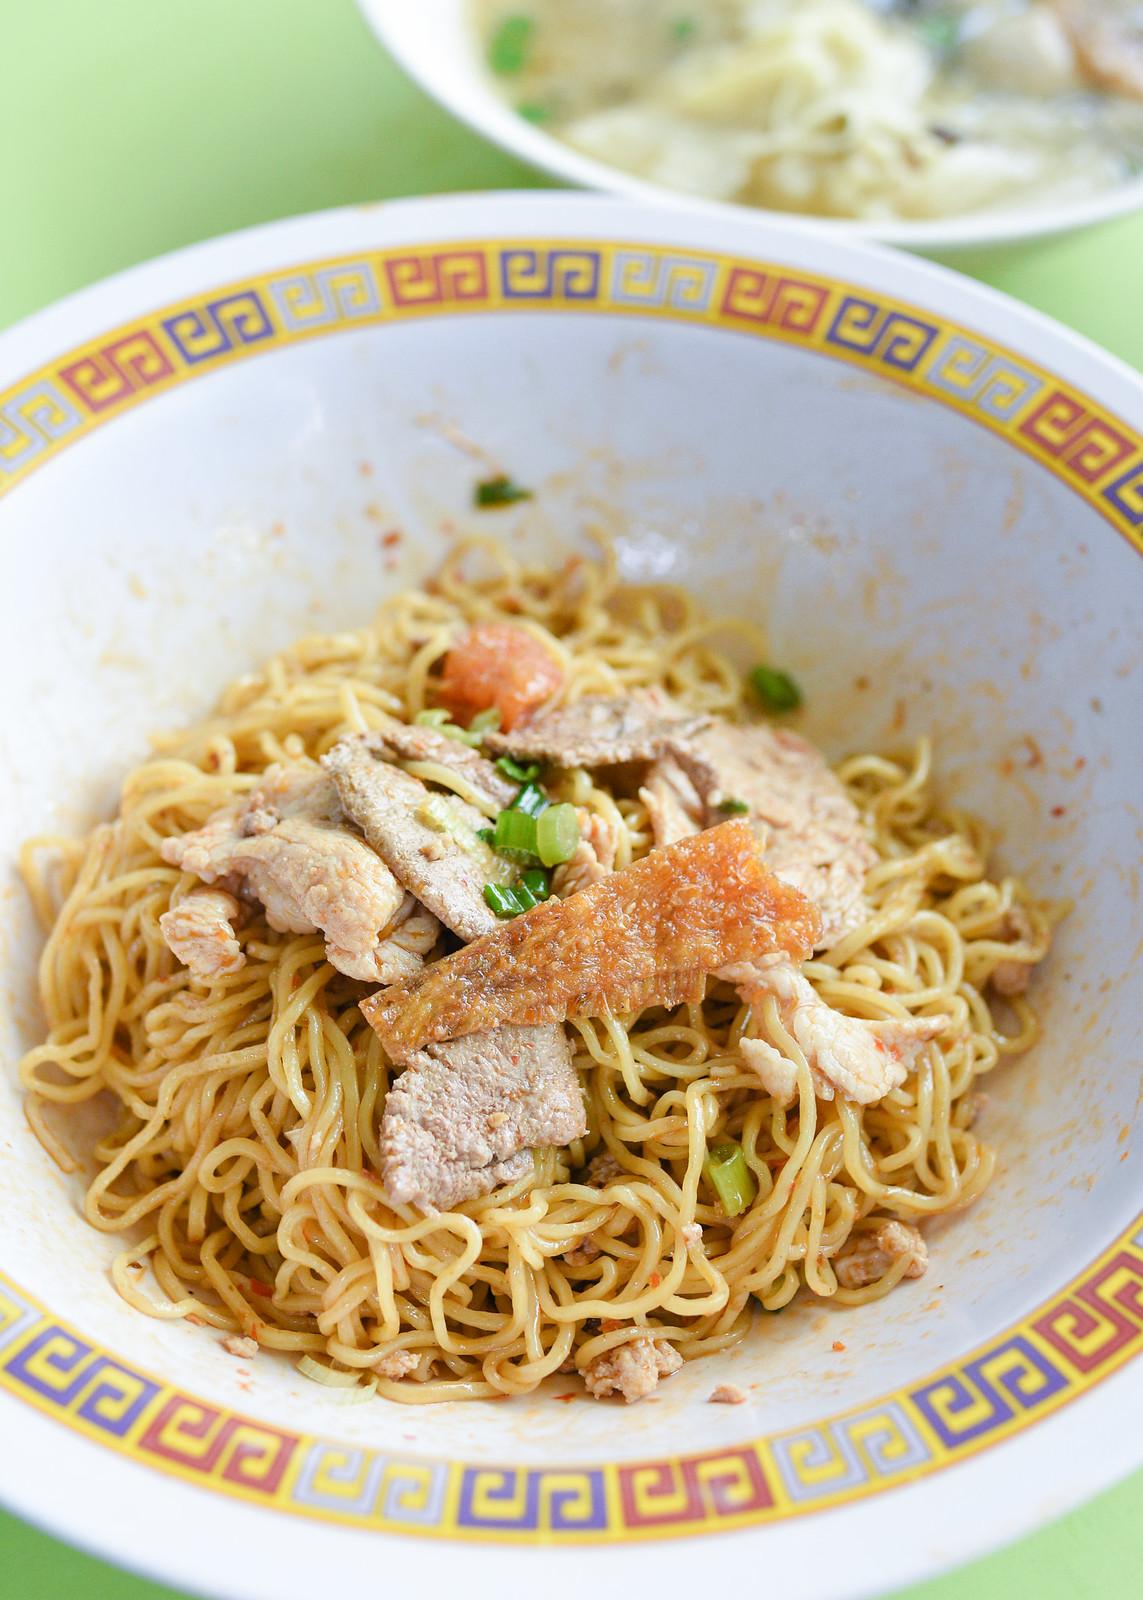 Tai Wah Pork Noodle Hong Lim Close Up